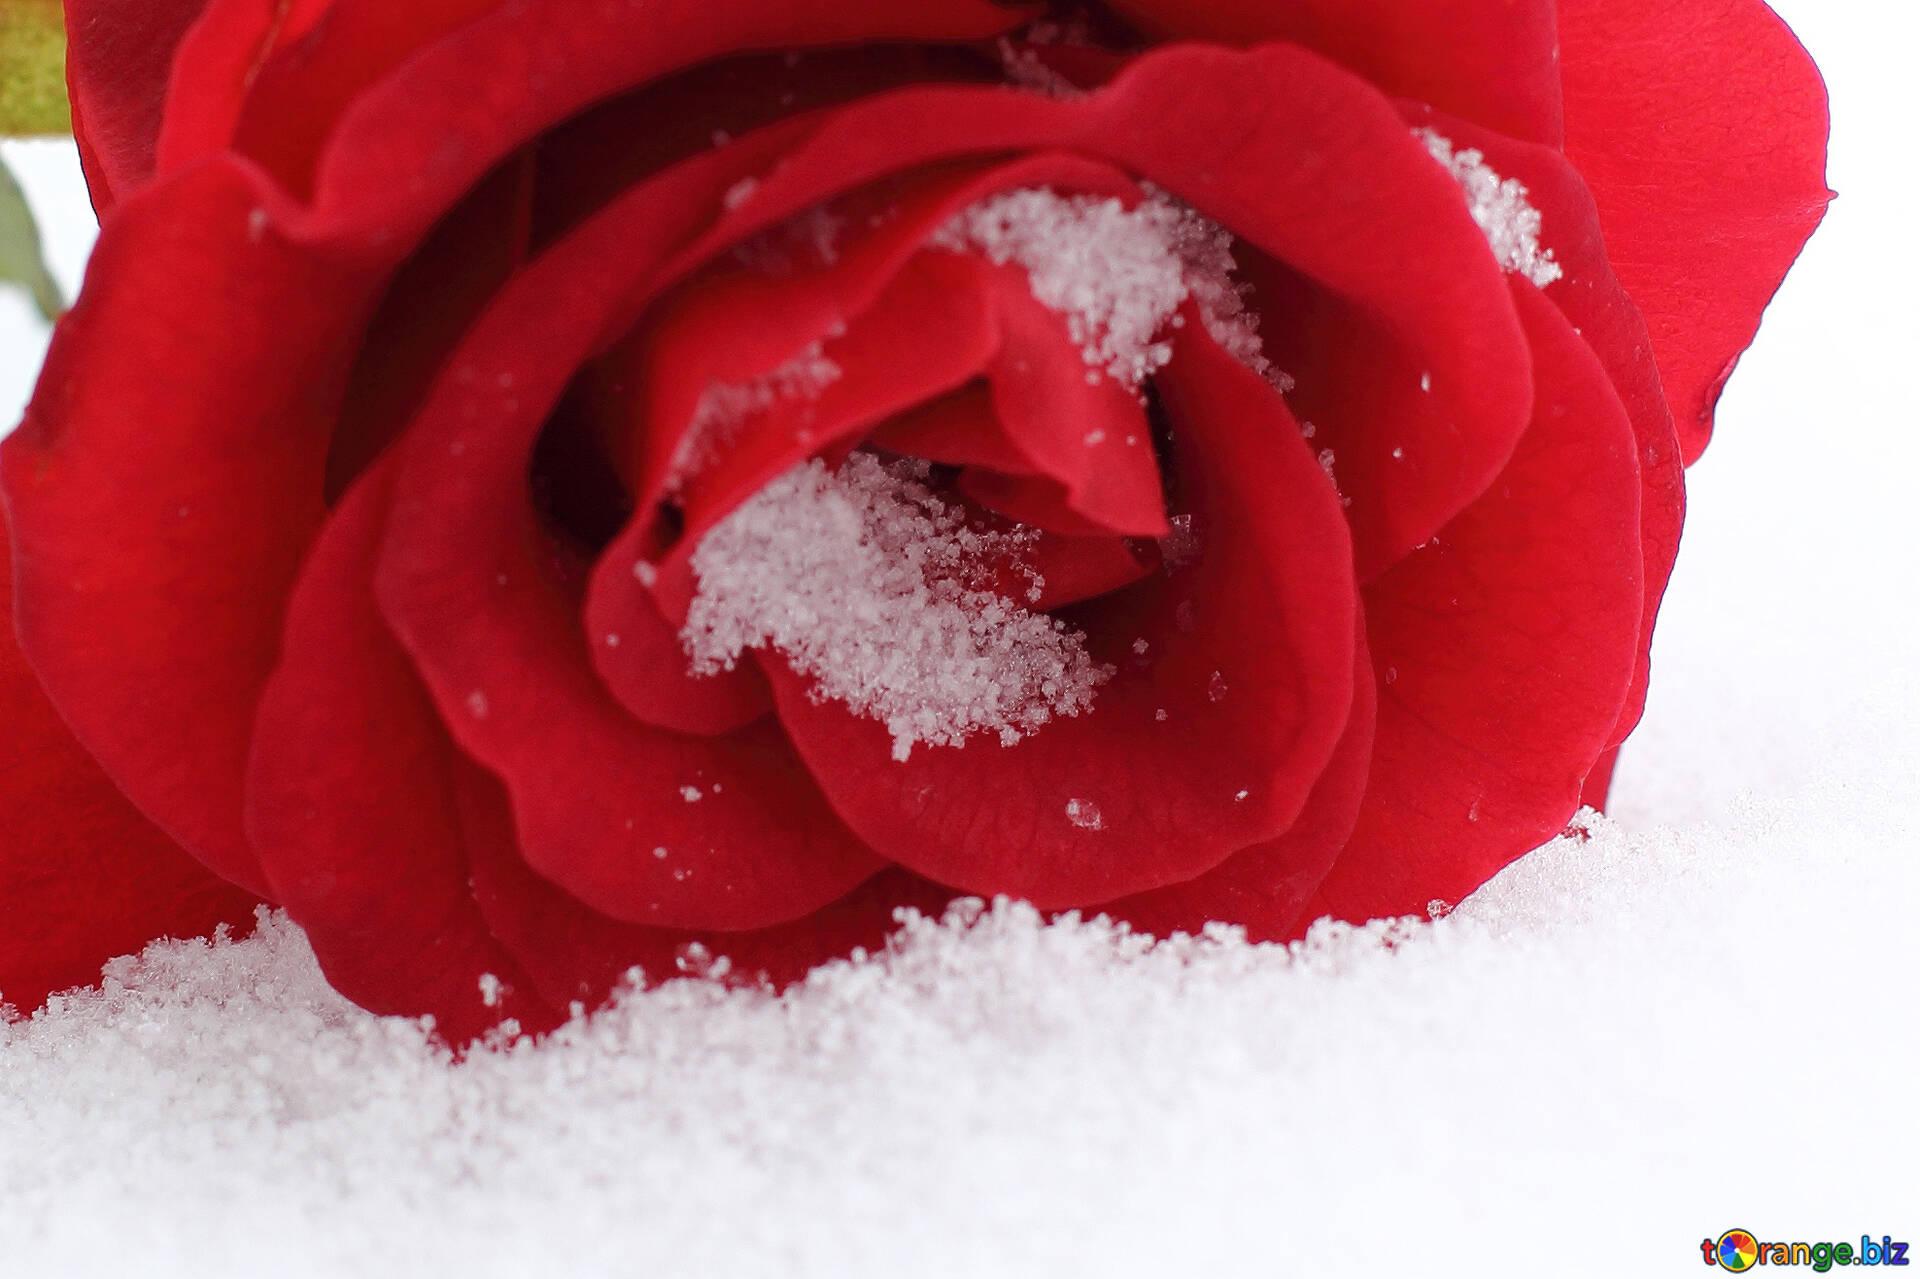 Rote Blume Schone Rote Blume Im Schnee Rose 16973